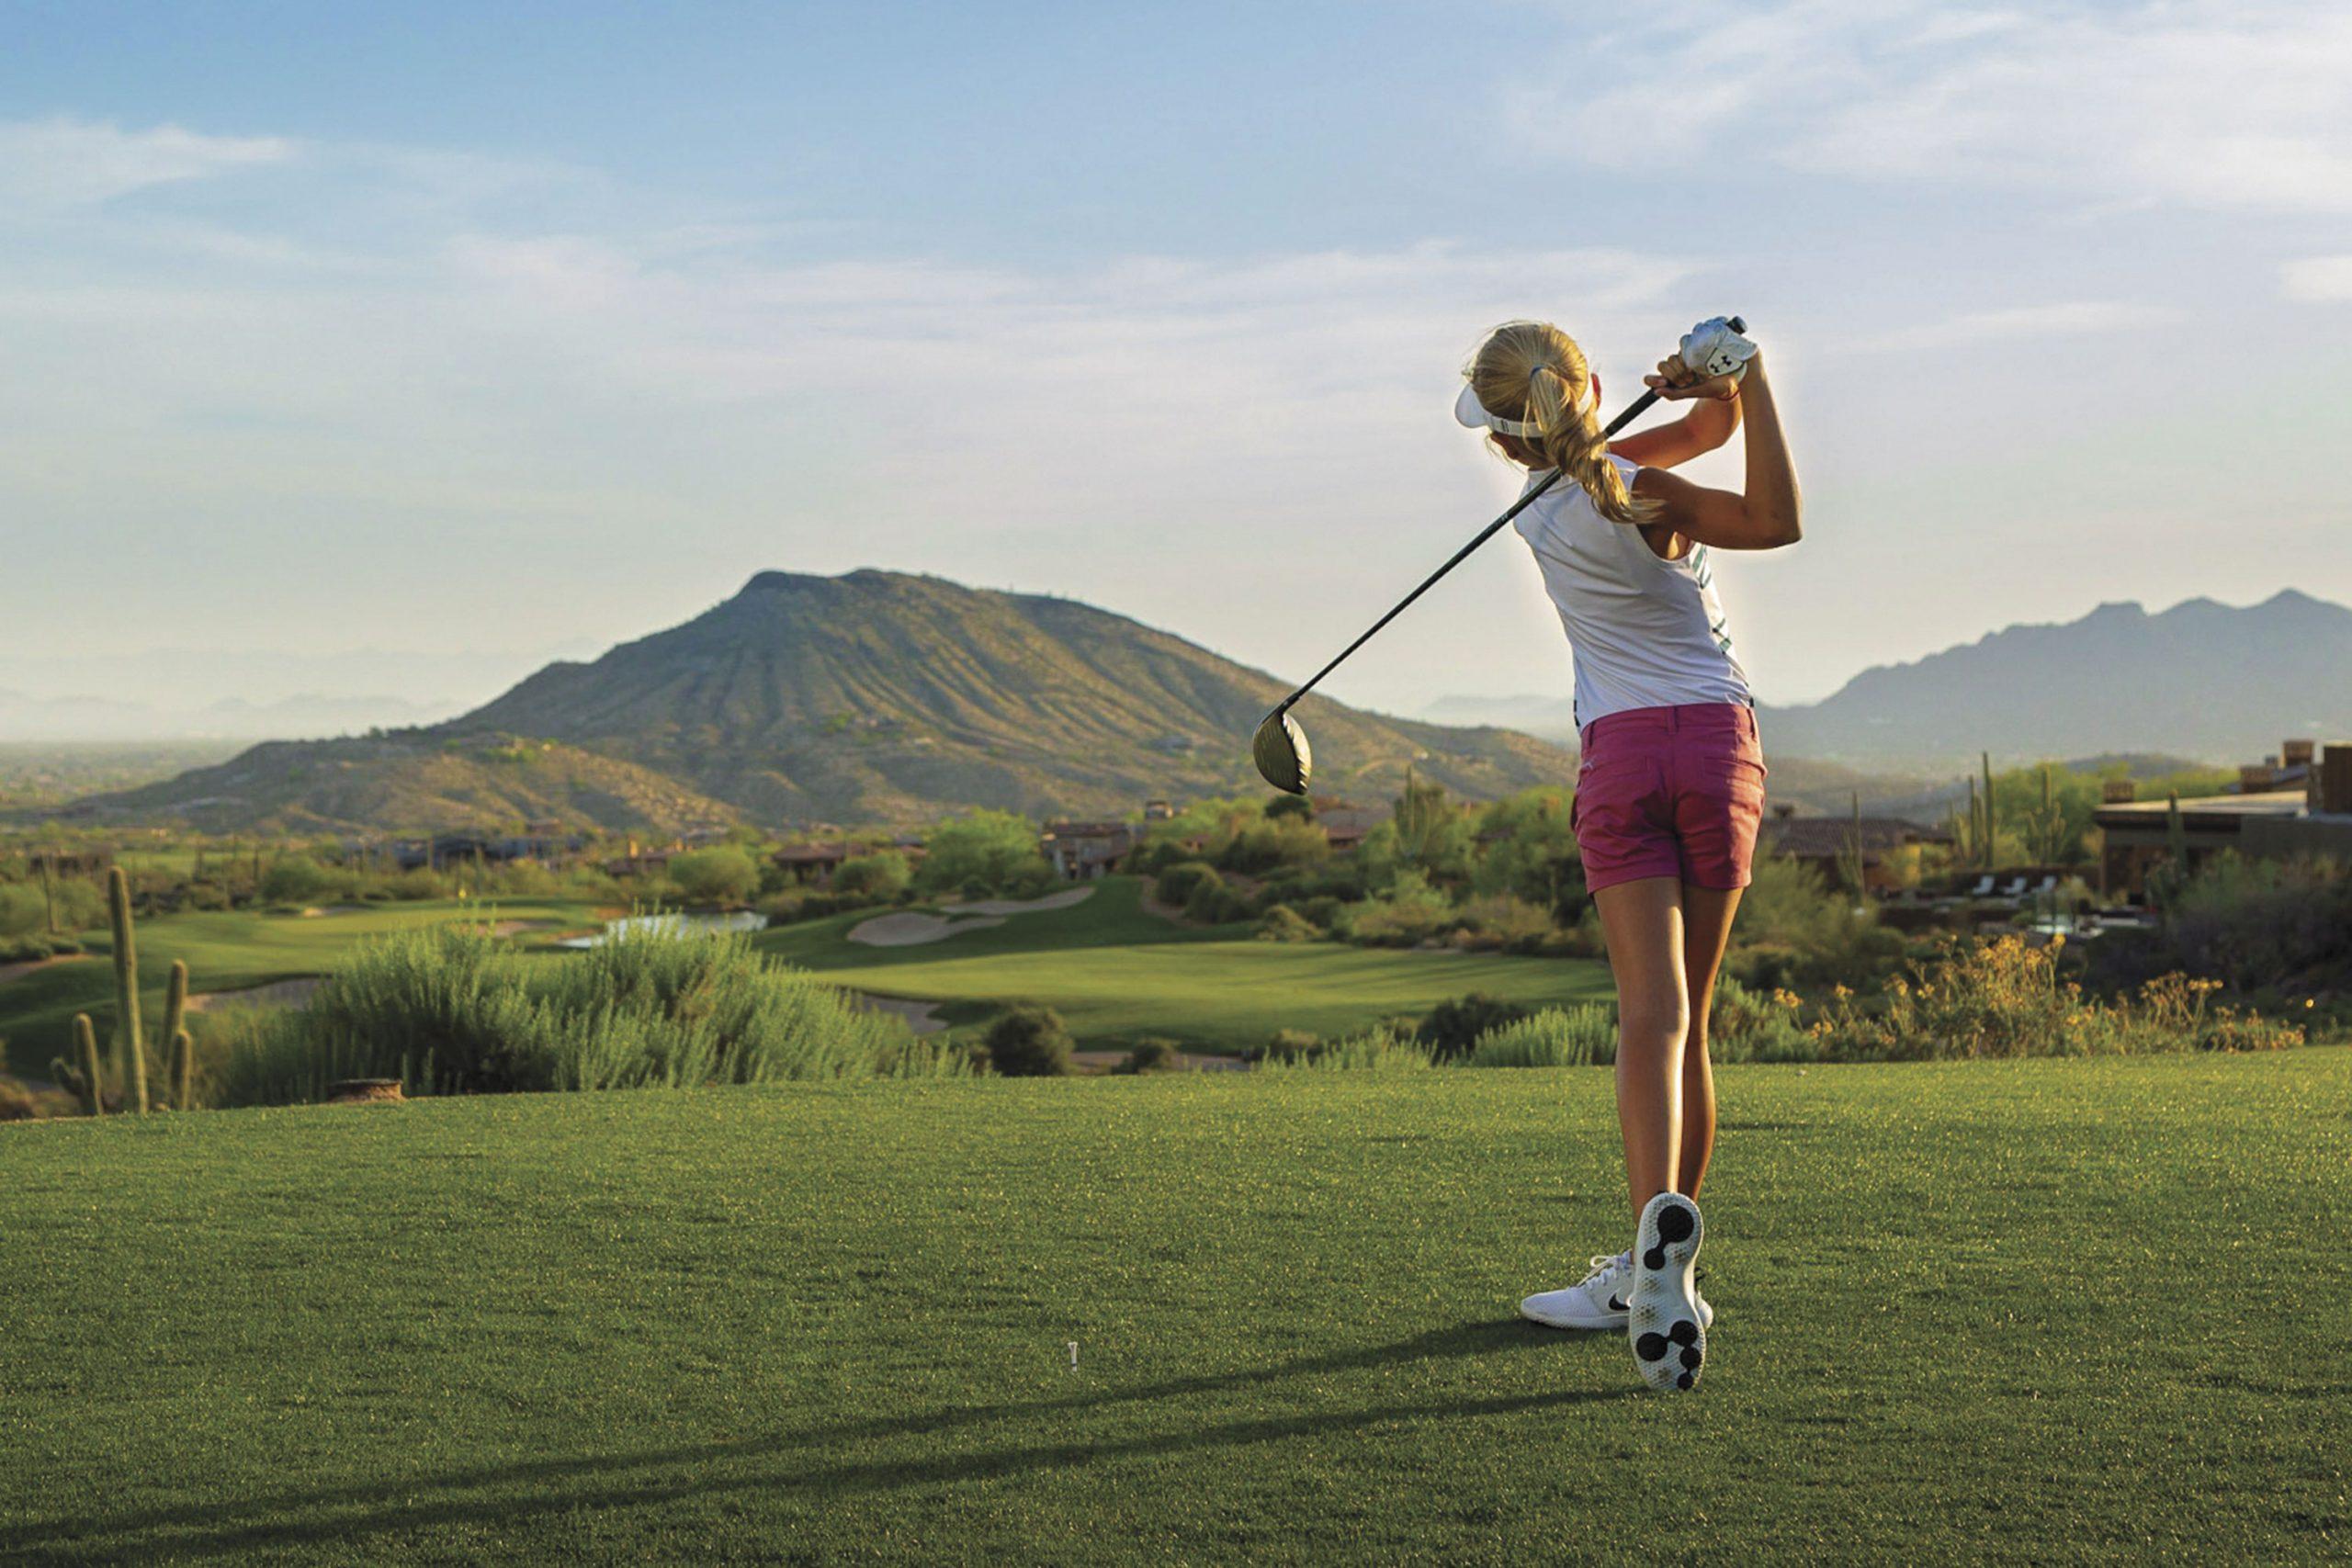 hitting the links at Desert Mountain Golf Glub; Photo courtesy Desert Mountain